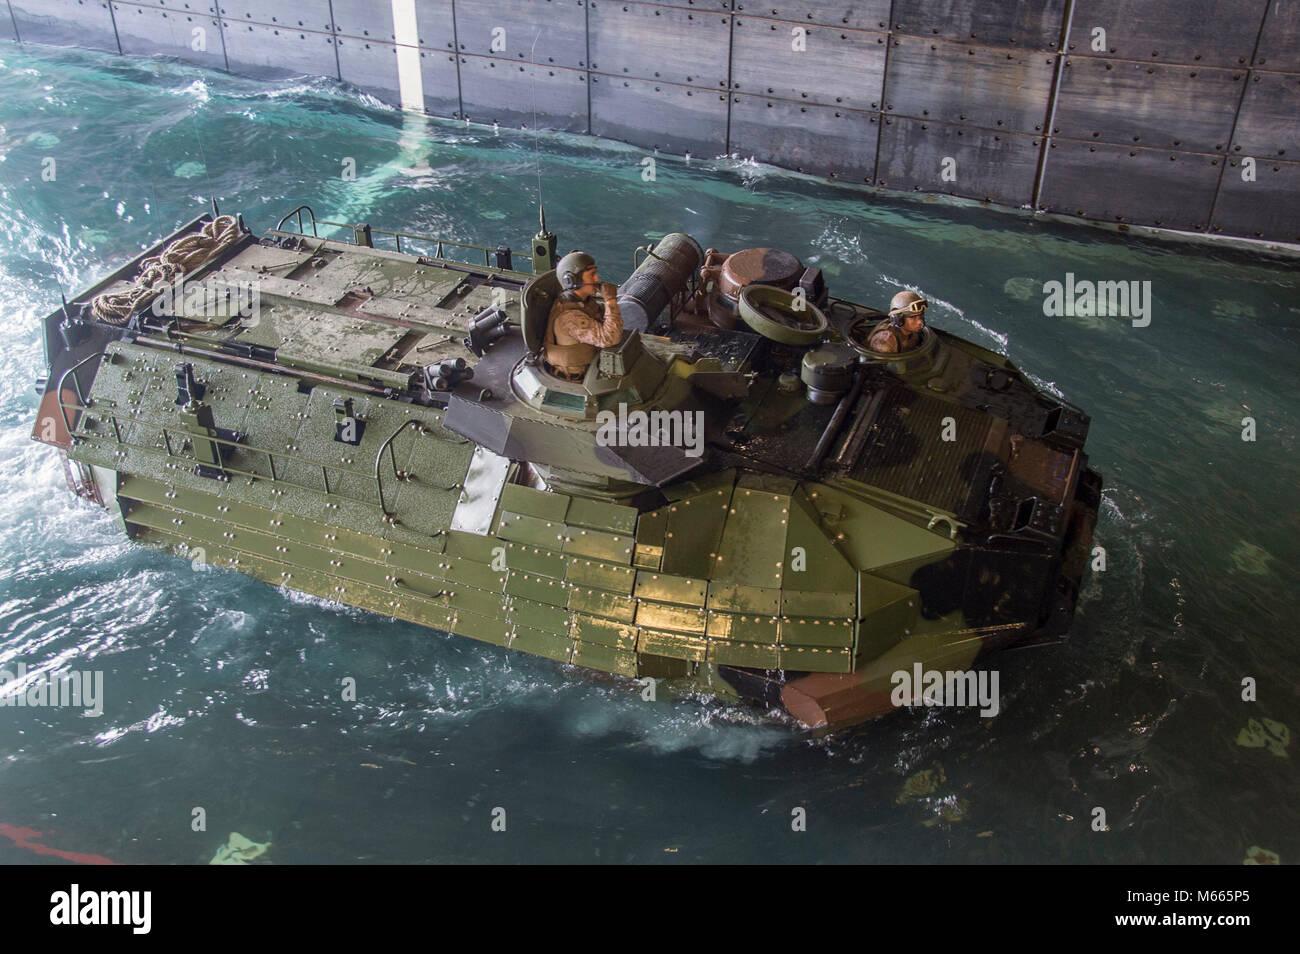 180227-N-DC385-200 GULF OF THAILAND (Feb. 27, 2018) An amphibious assault vehicle (AAV), assigned to the 3rd Assault Stock Photo